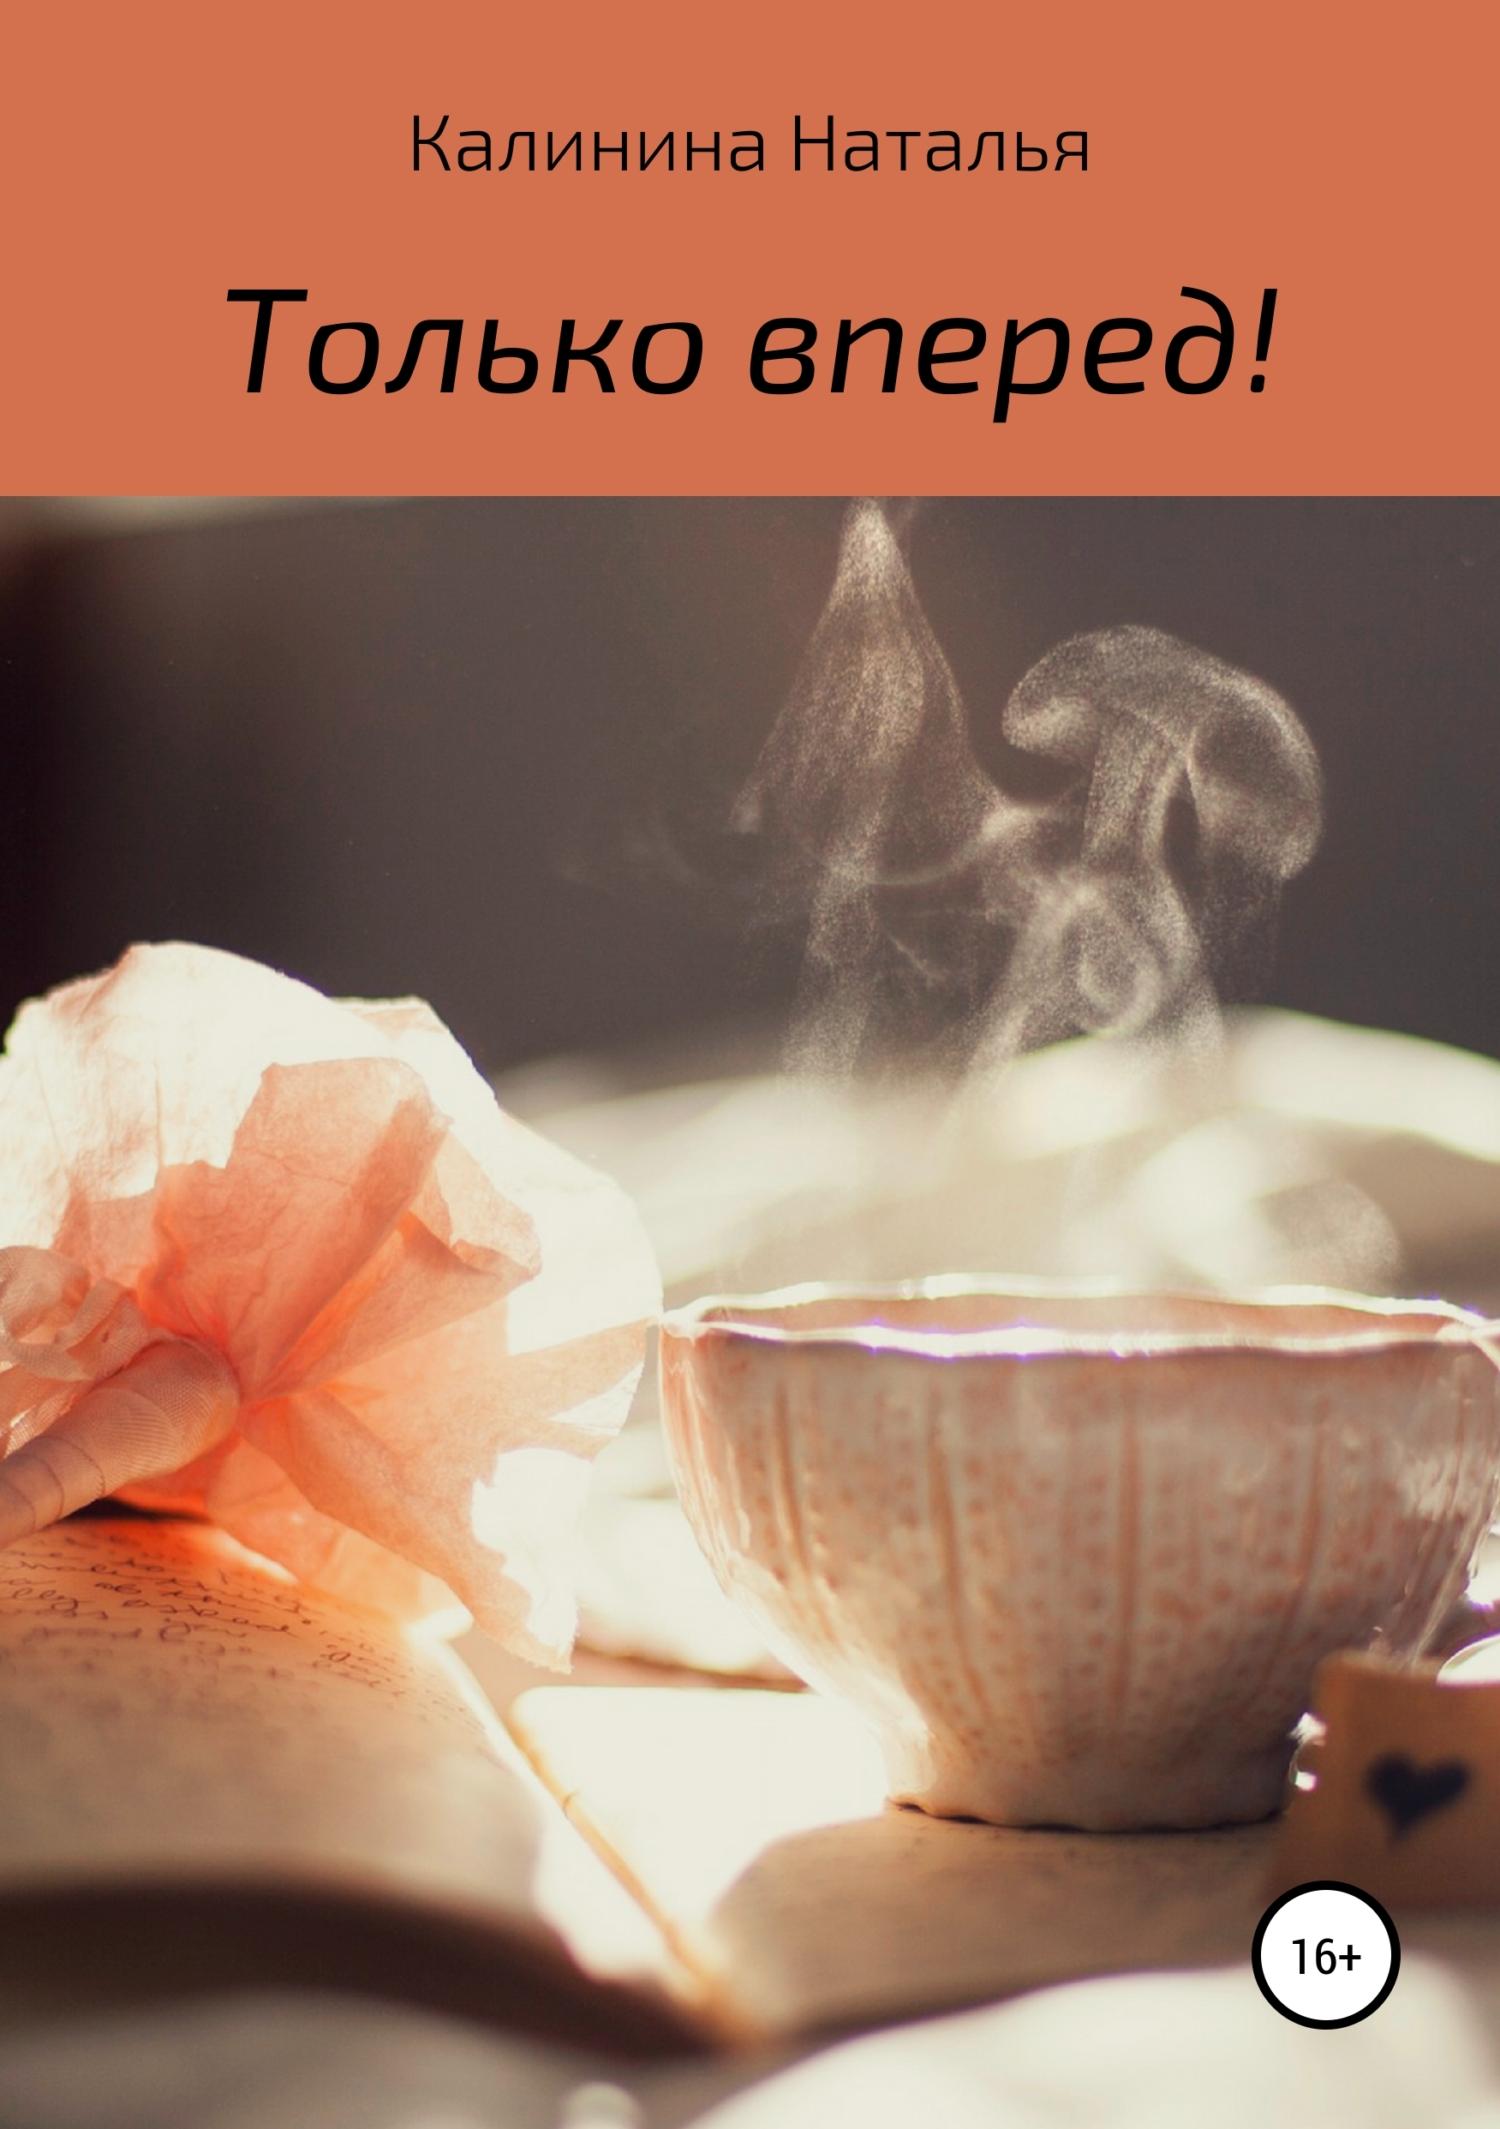 Наталья Калинина Только вперёд! наталья александрова персона царских кровей